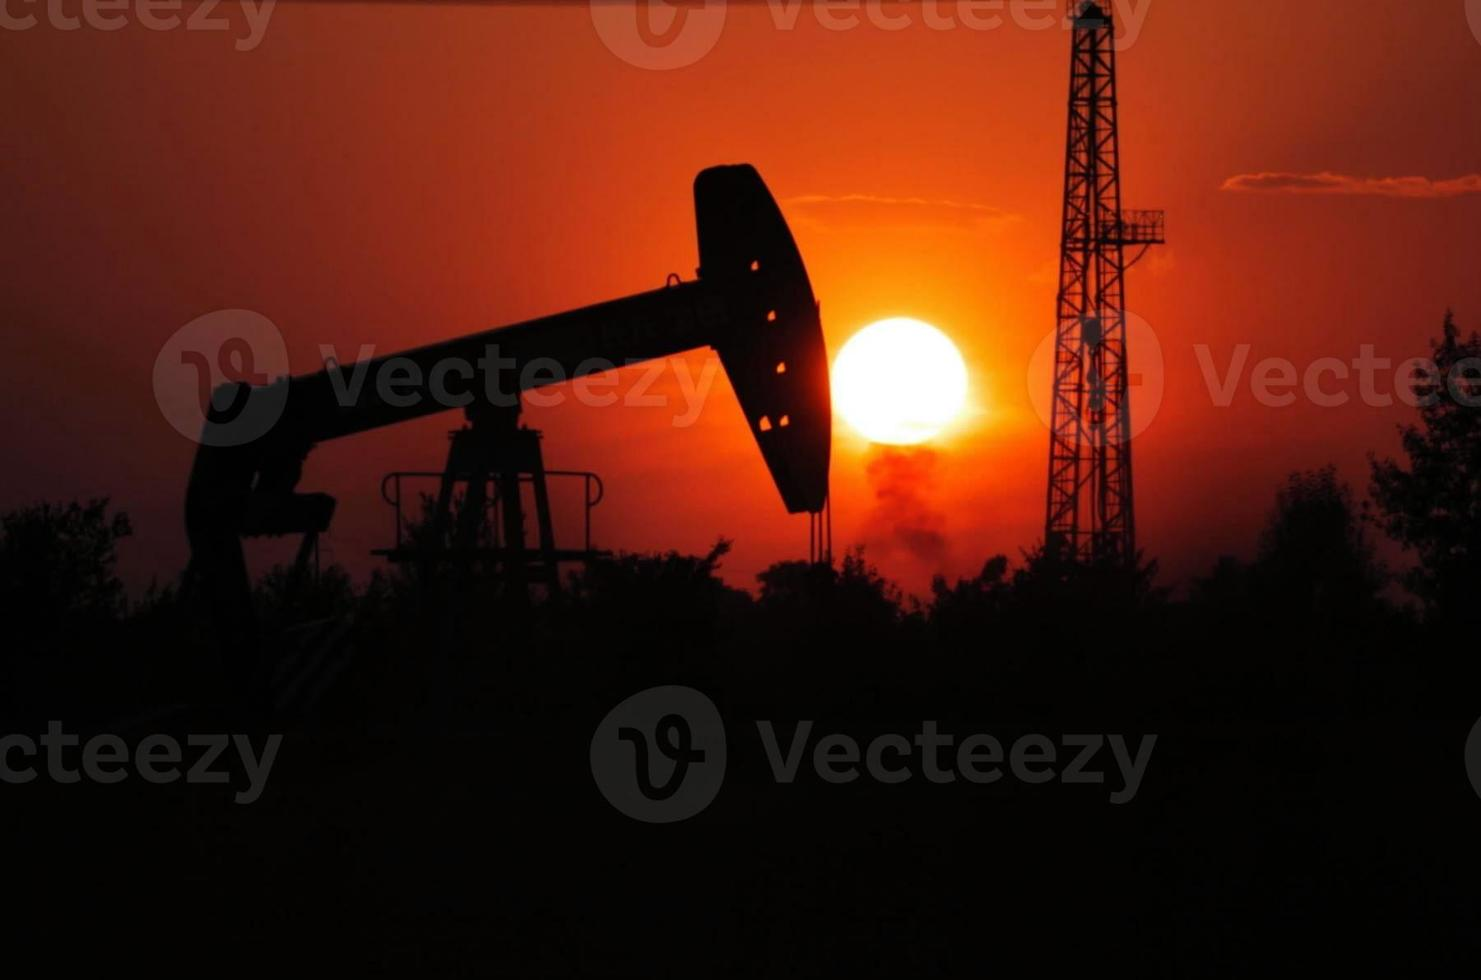 extractie van petroleum-pozzi petroliferi foto